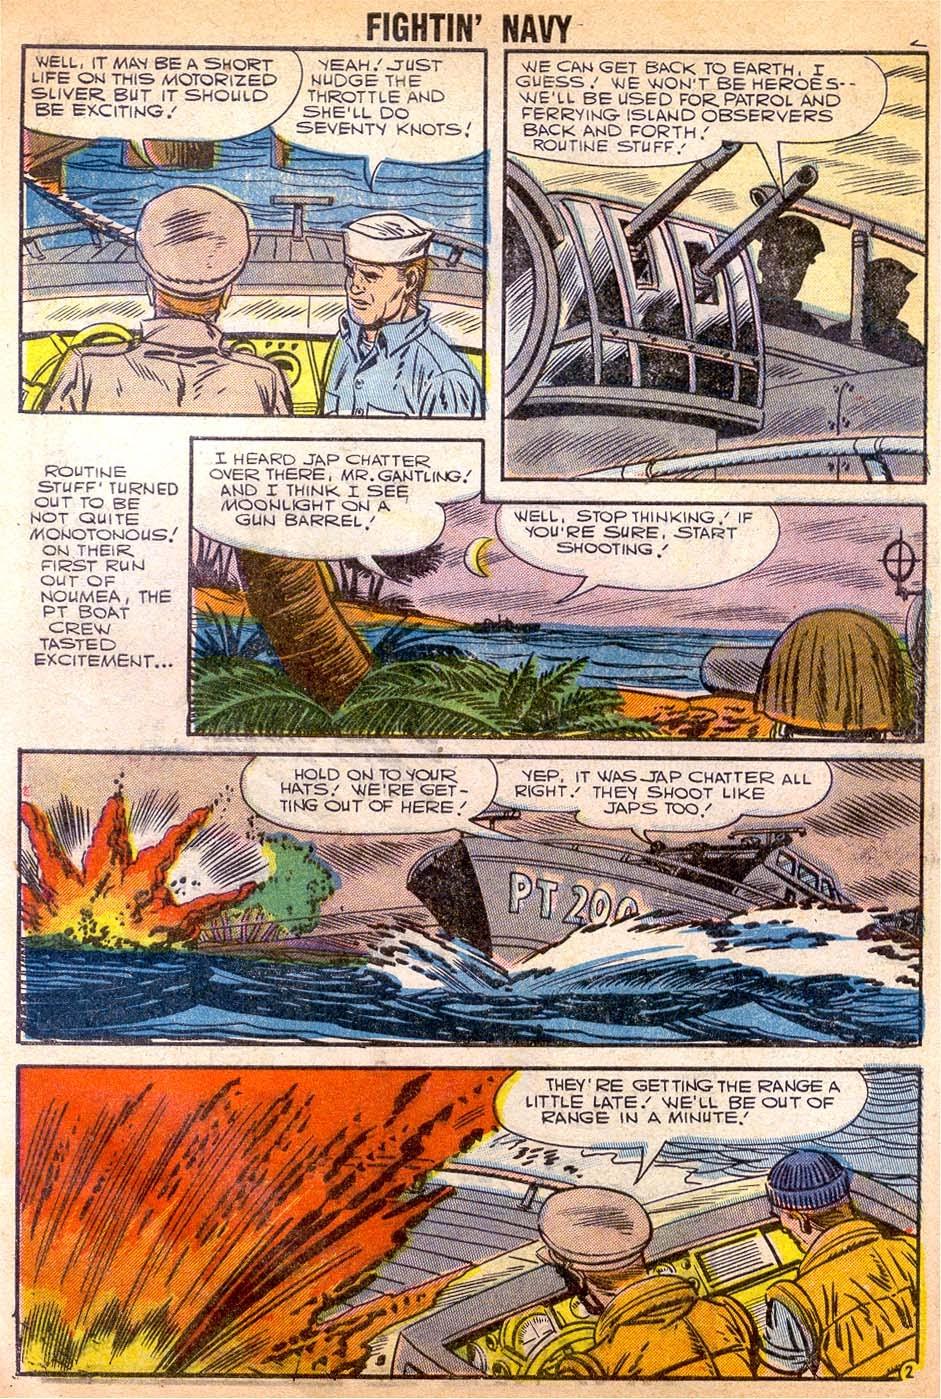 Read online Fightin' Navy comic -  Issue #79 - 4